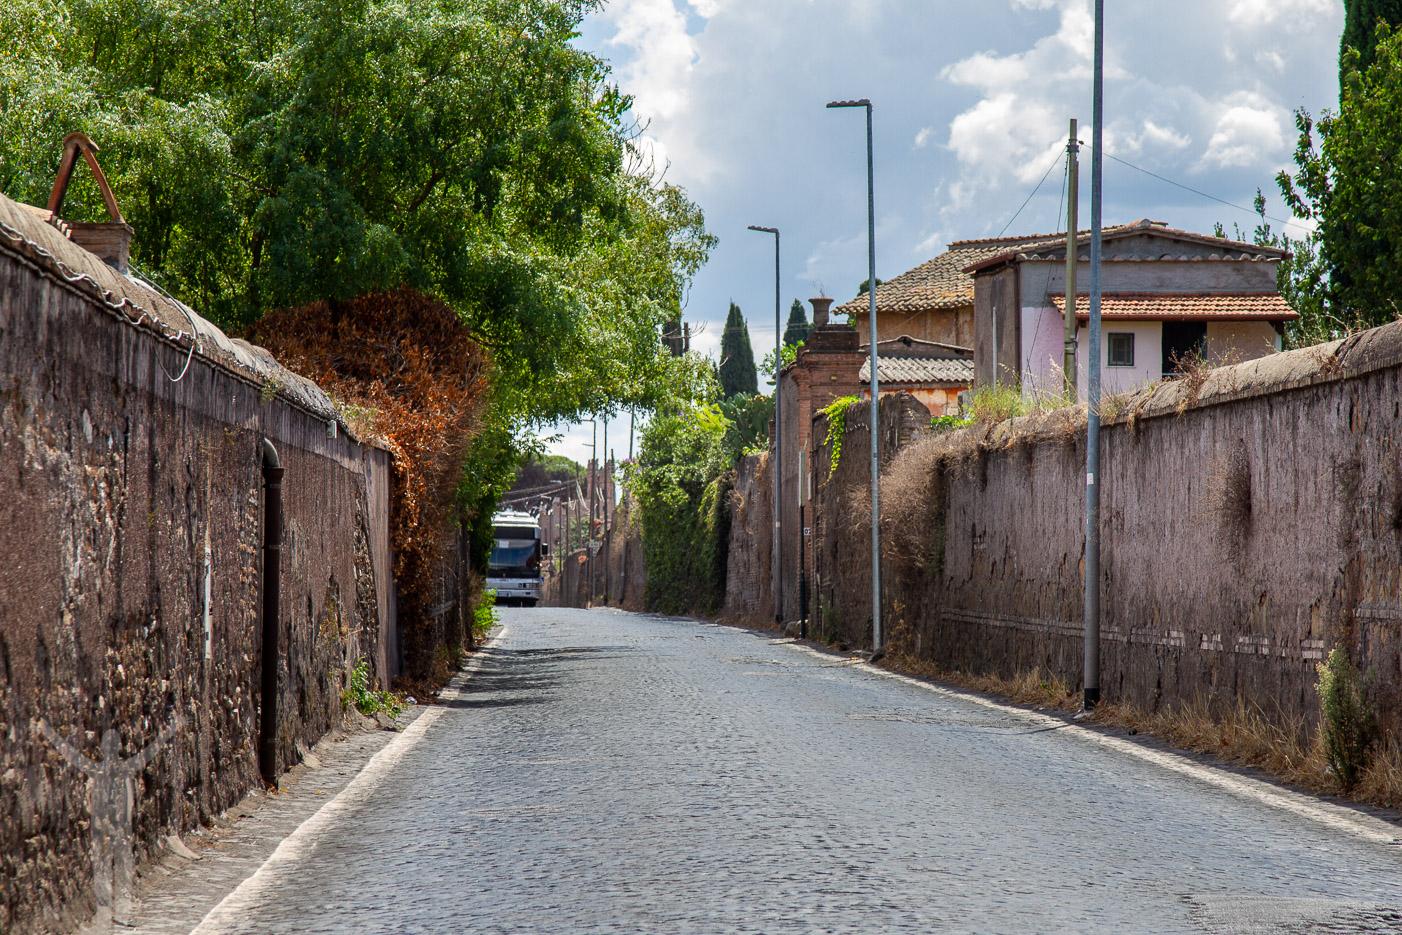 Vi mötte även bussar på Via Appia Antica